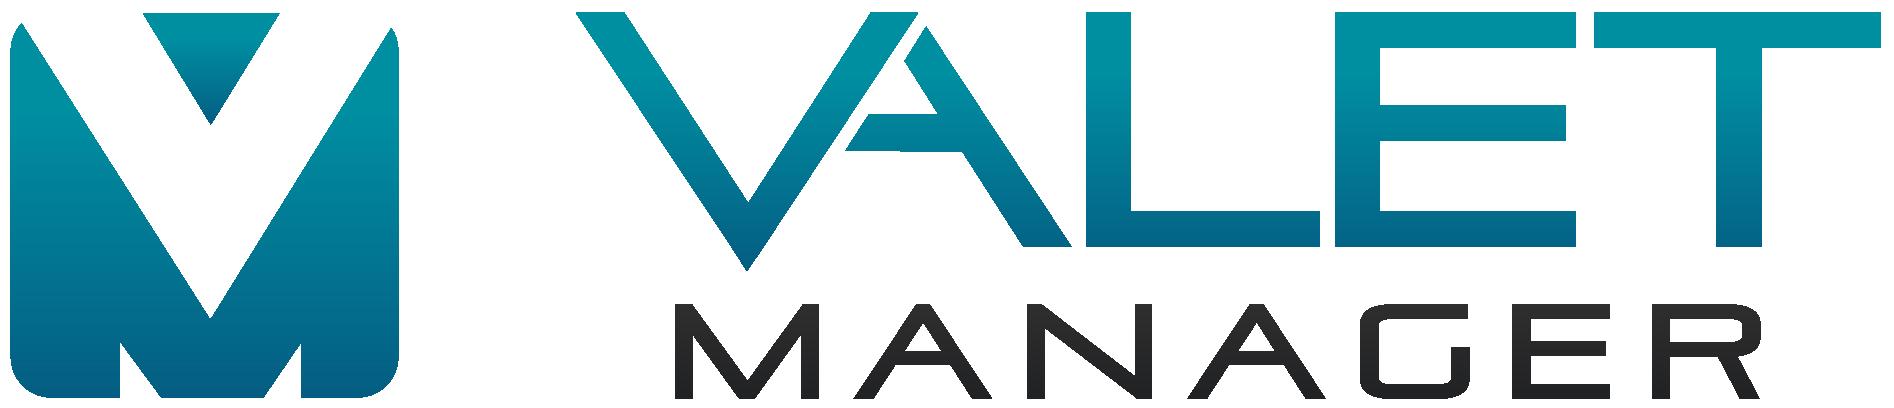 Valet Manager